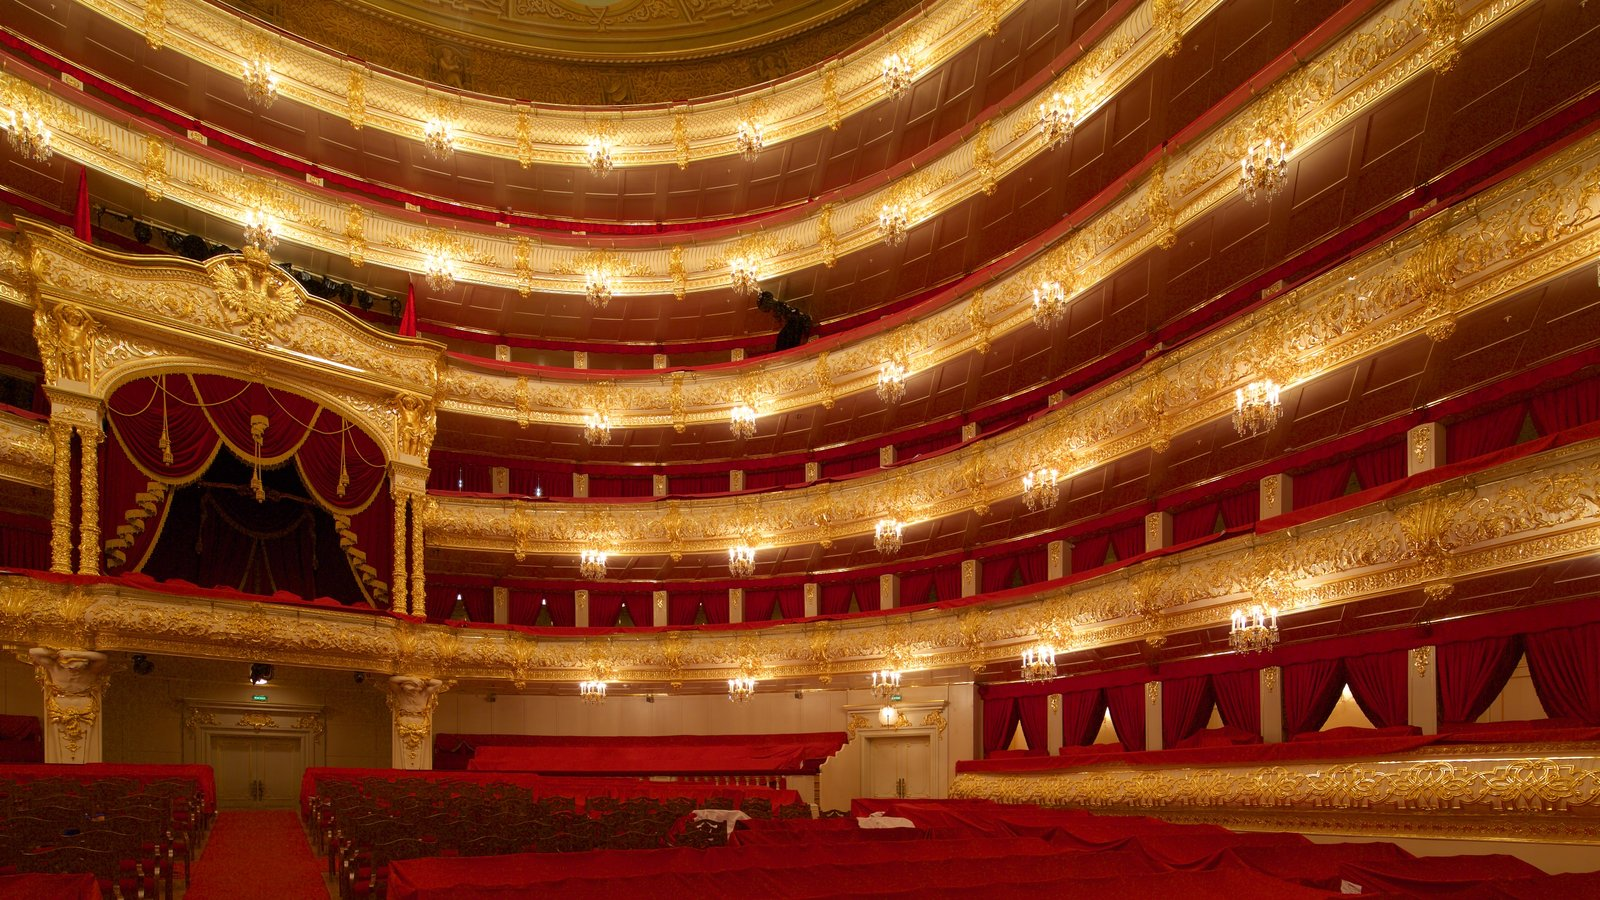 Teatro Bolshoi mostrando arquitetura de patrimônio, cenas de teatro e vistas internas